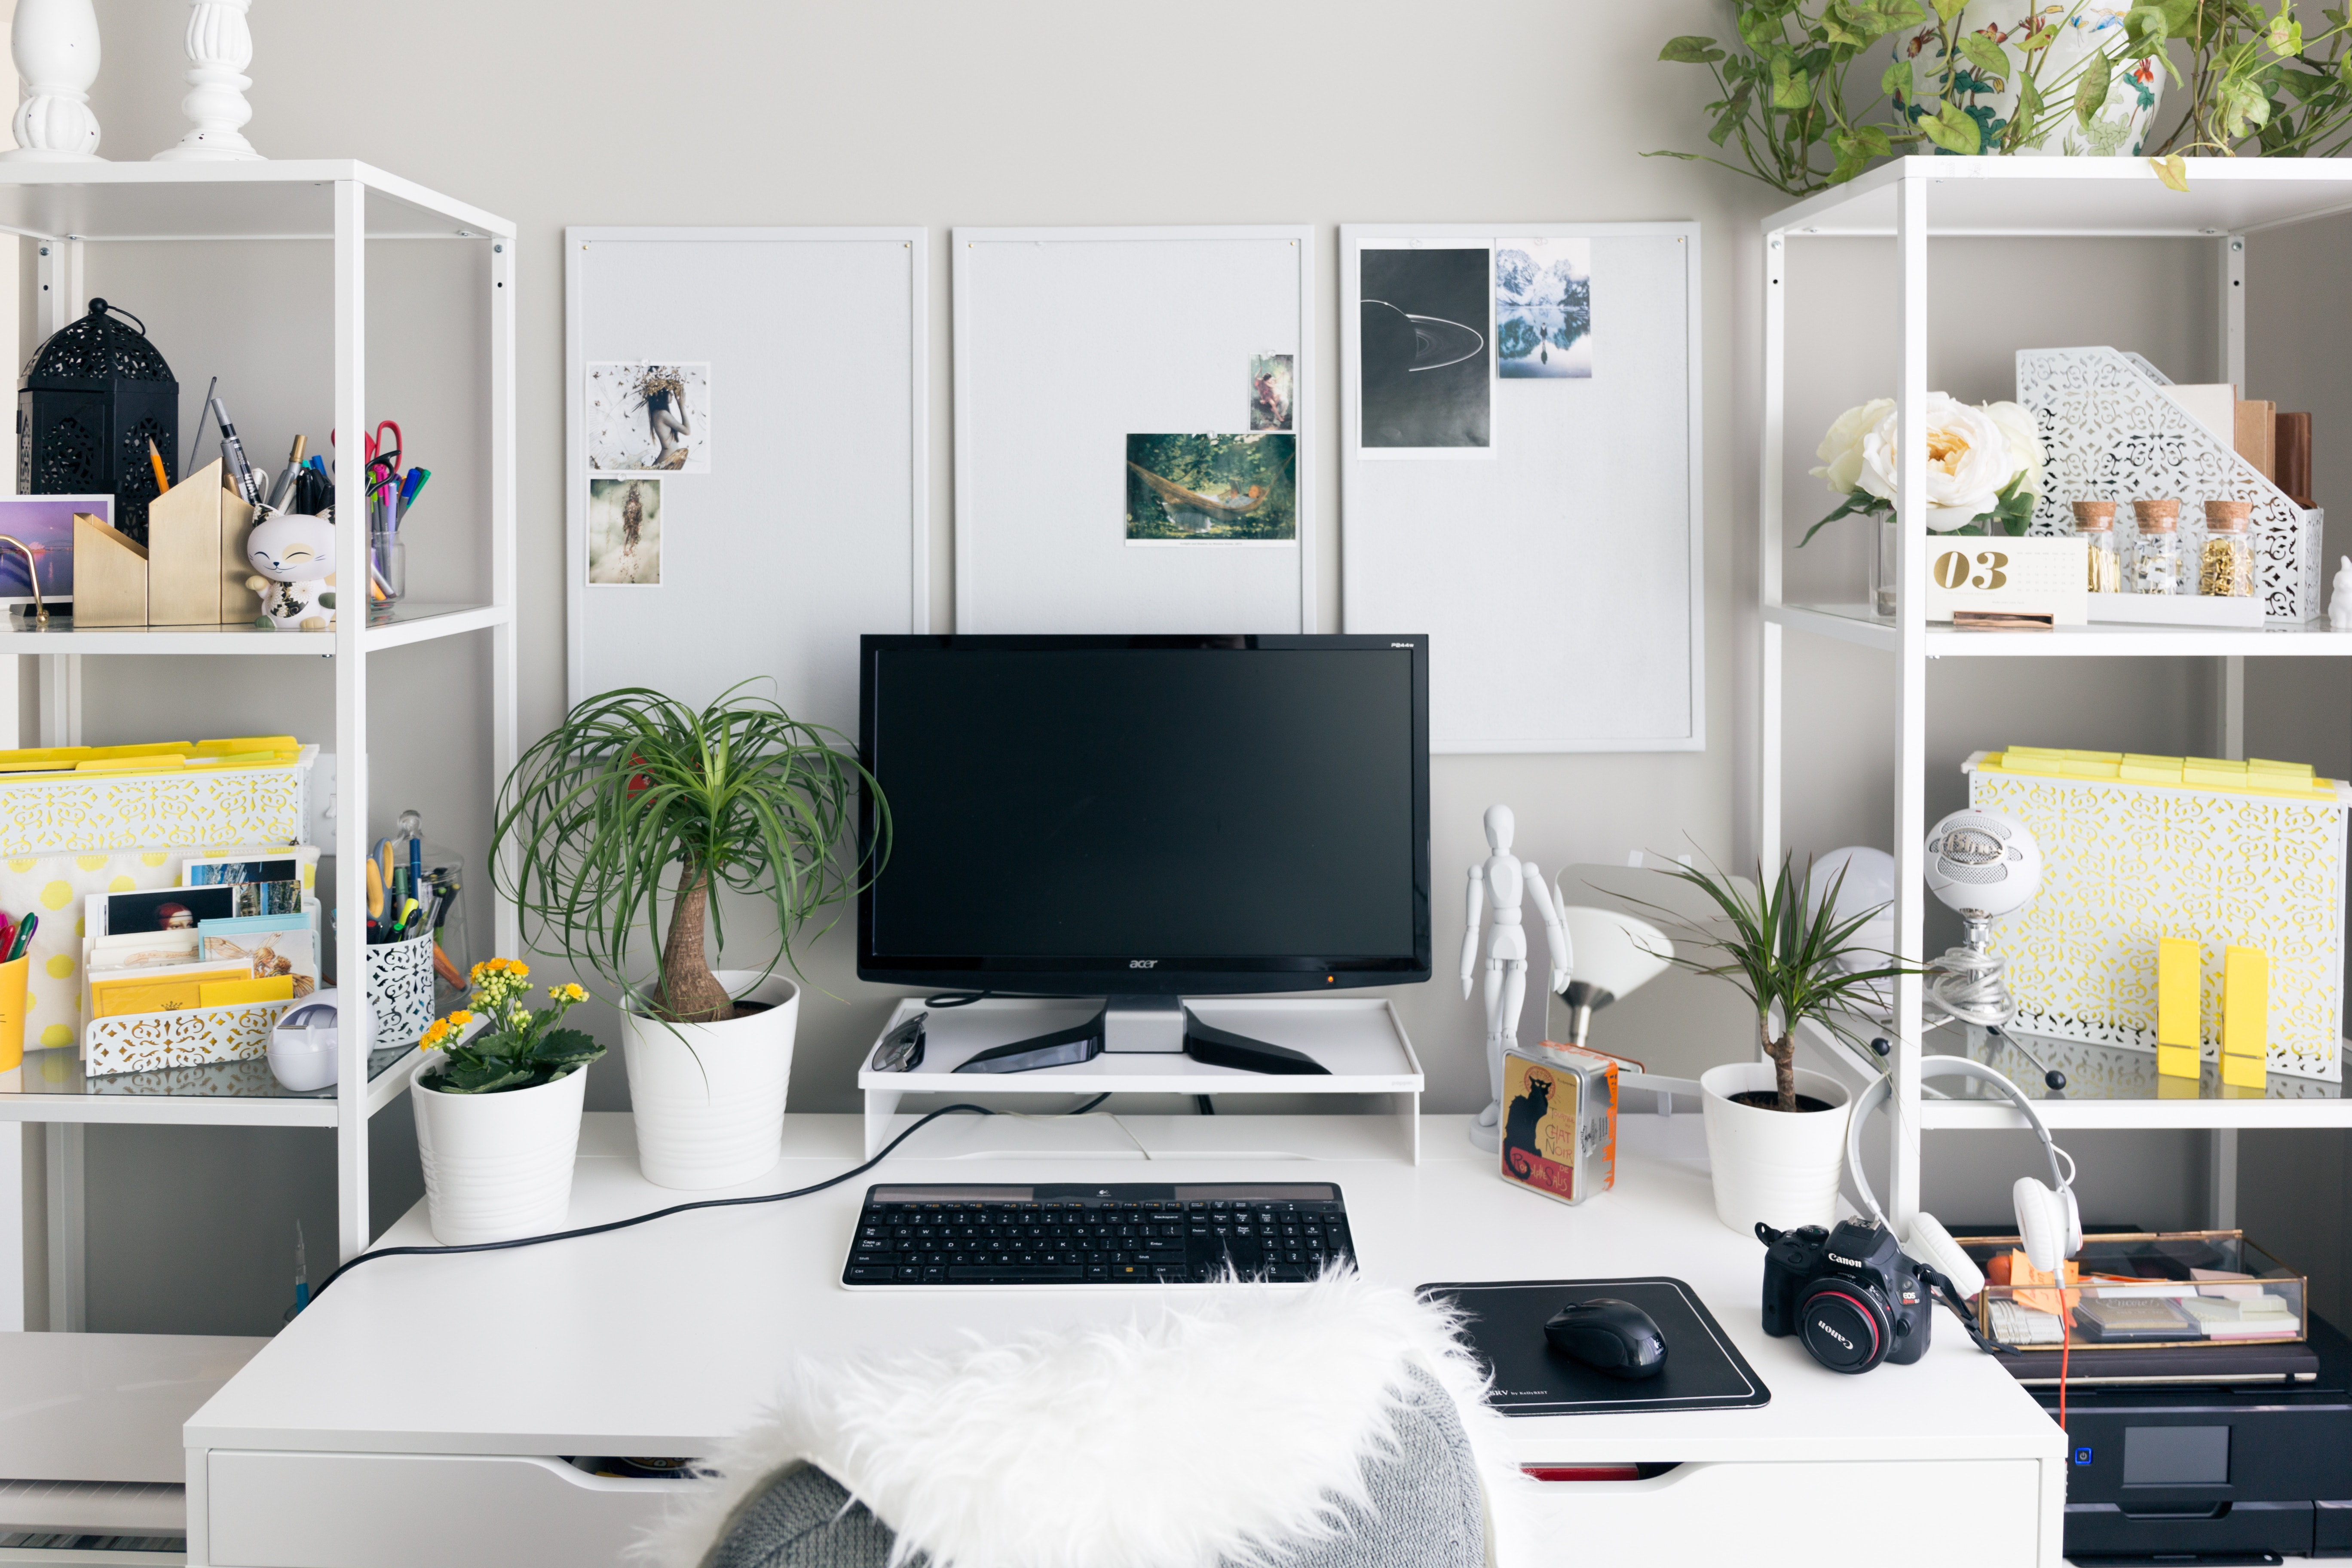 home office setup3 - Beaming